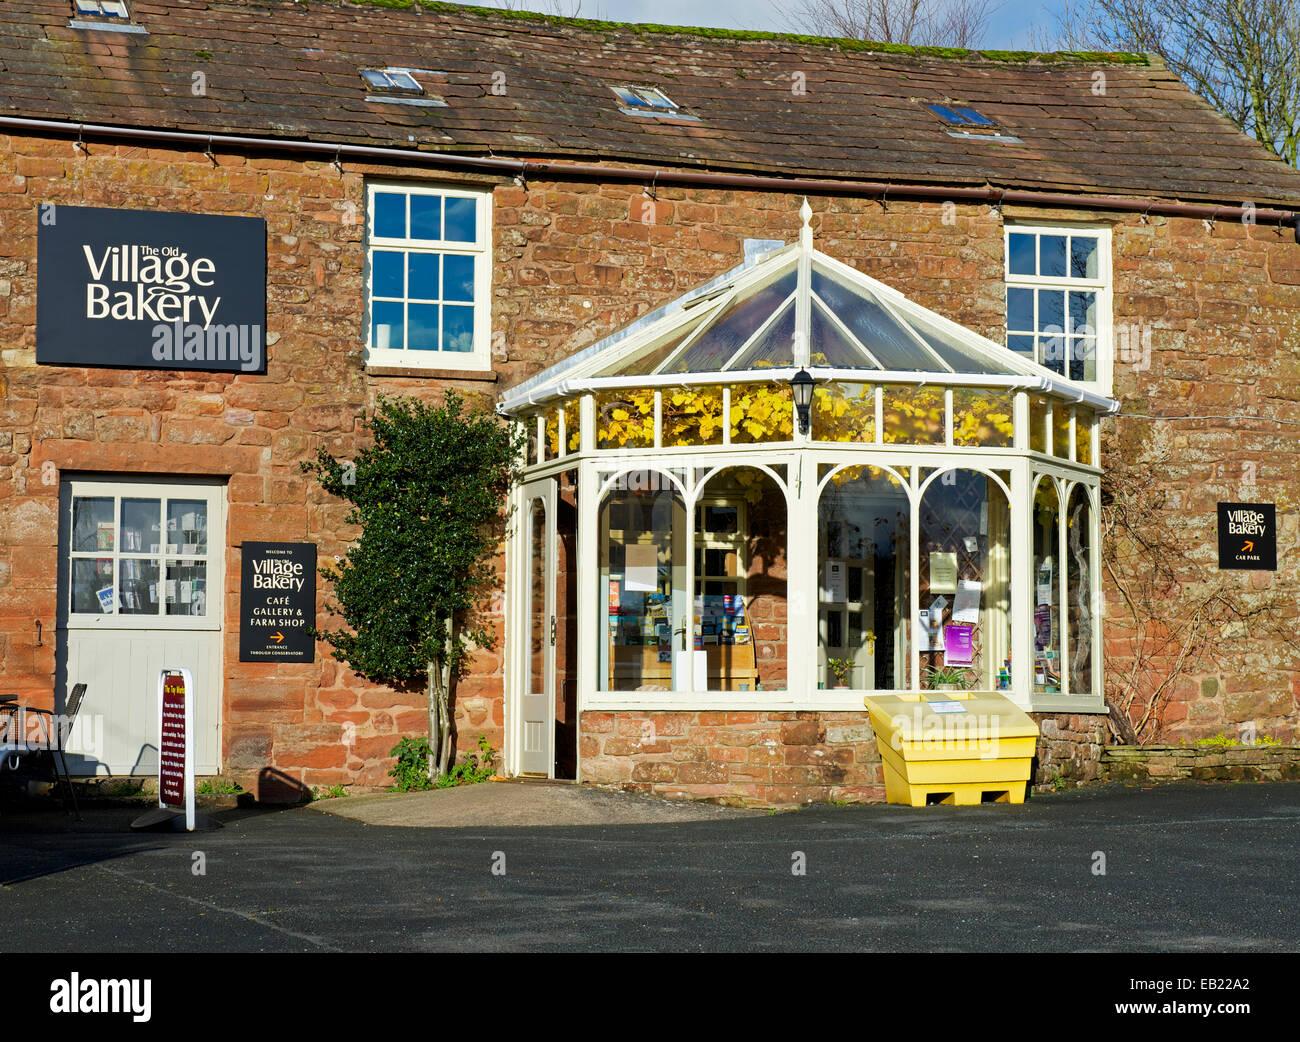 The Village Bakery, Melmerby, Eden Valley, Cumbria, England UK - Stock Image